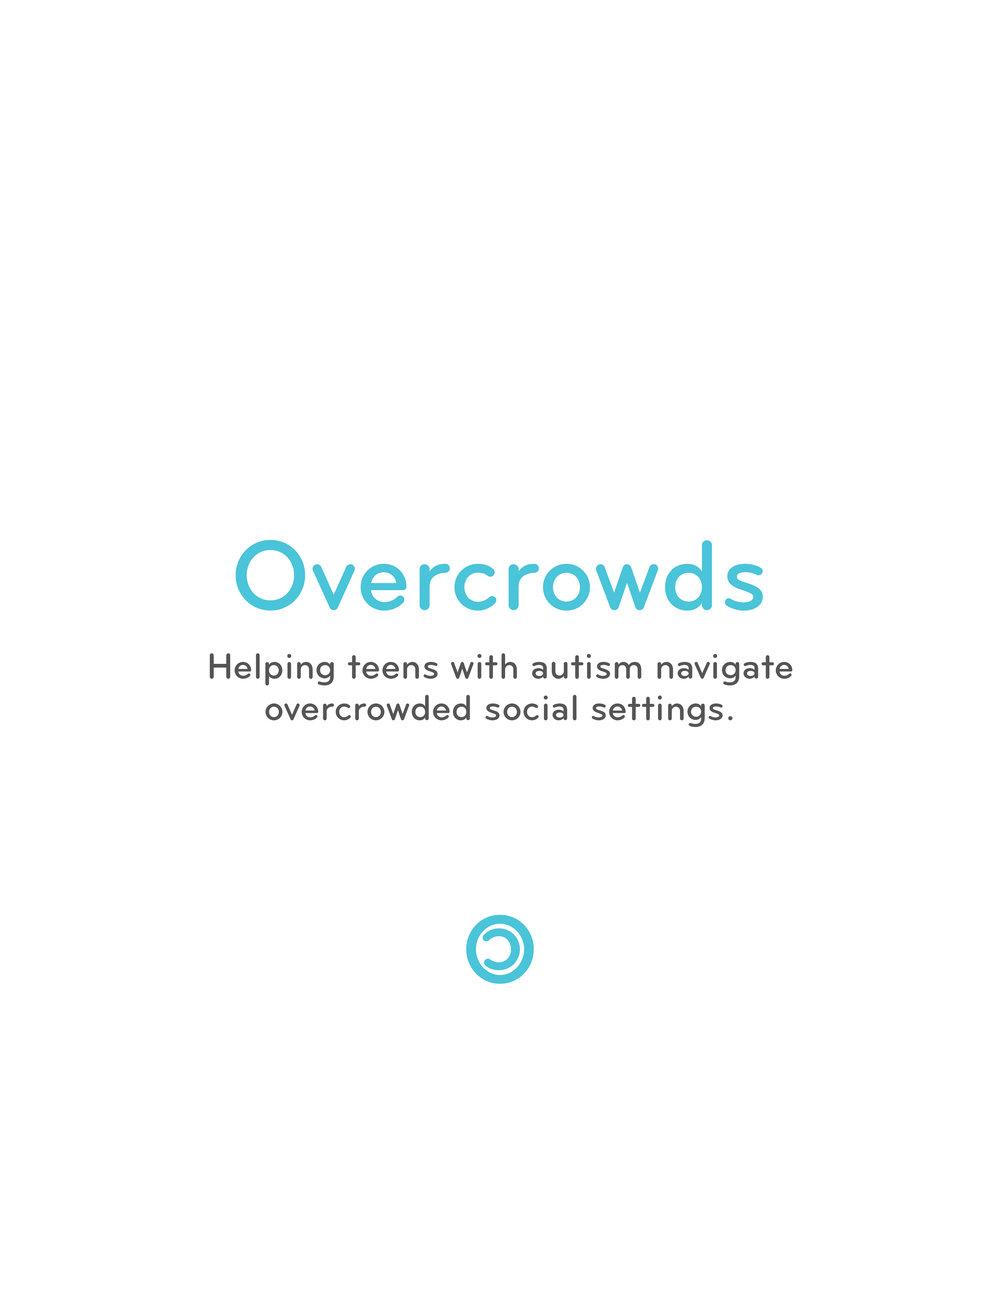 Overcrowds_-13.jpg